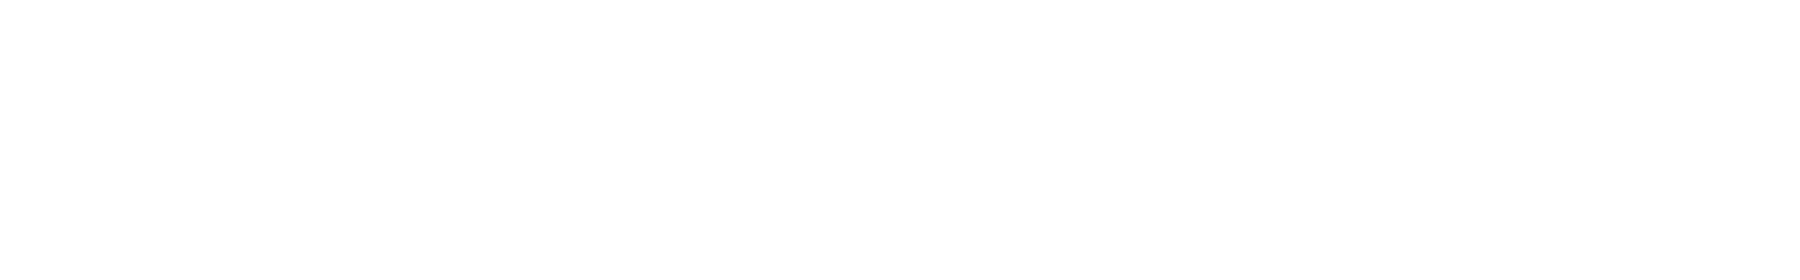 808 3